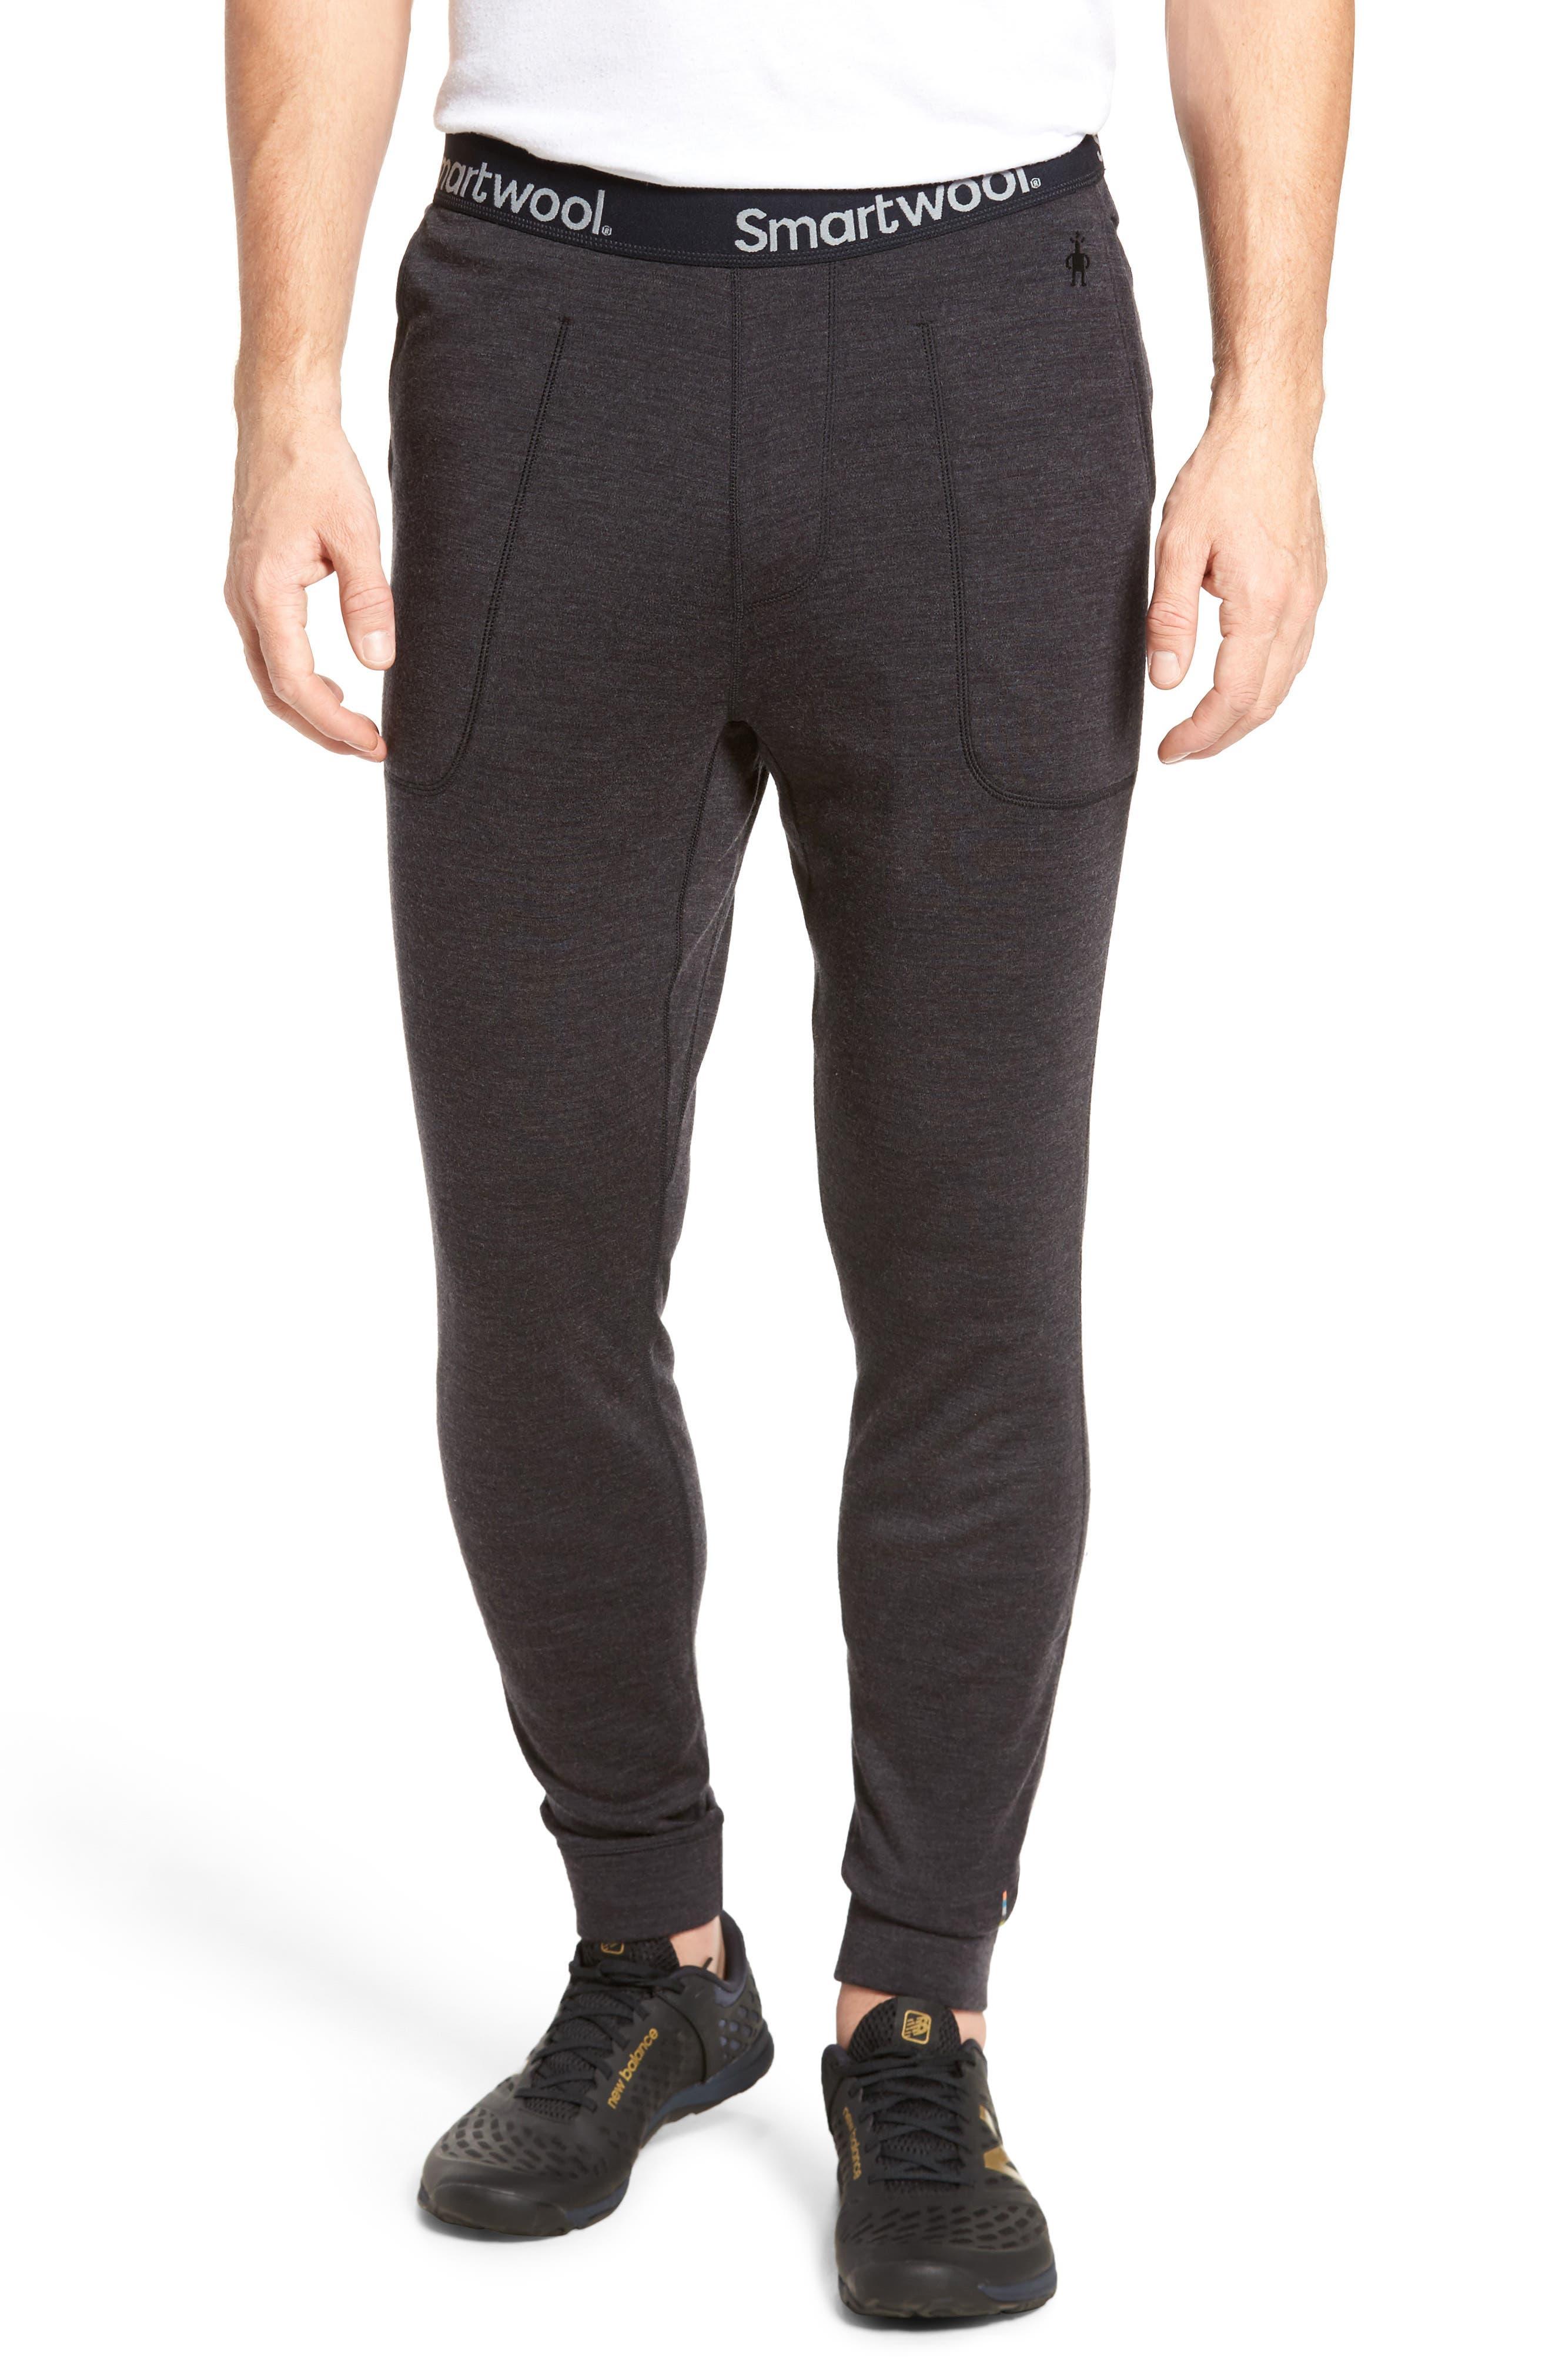 SMARTWOOL 250 Merino Wool Jogger Pants, Main, color, CHARCOAL